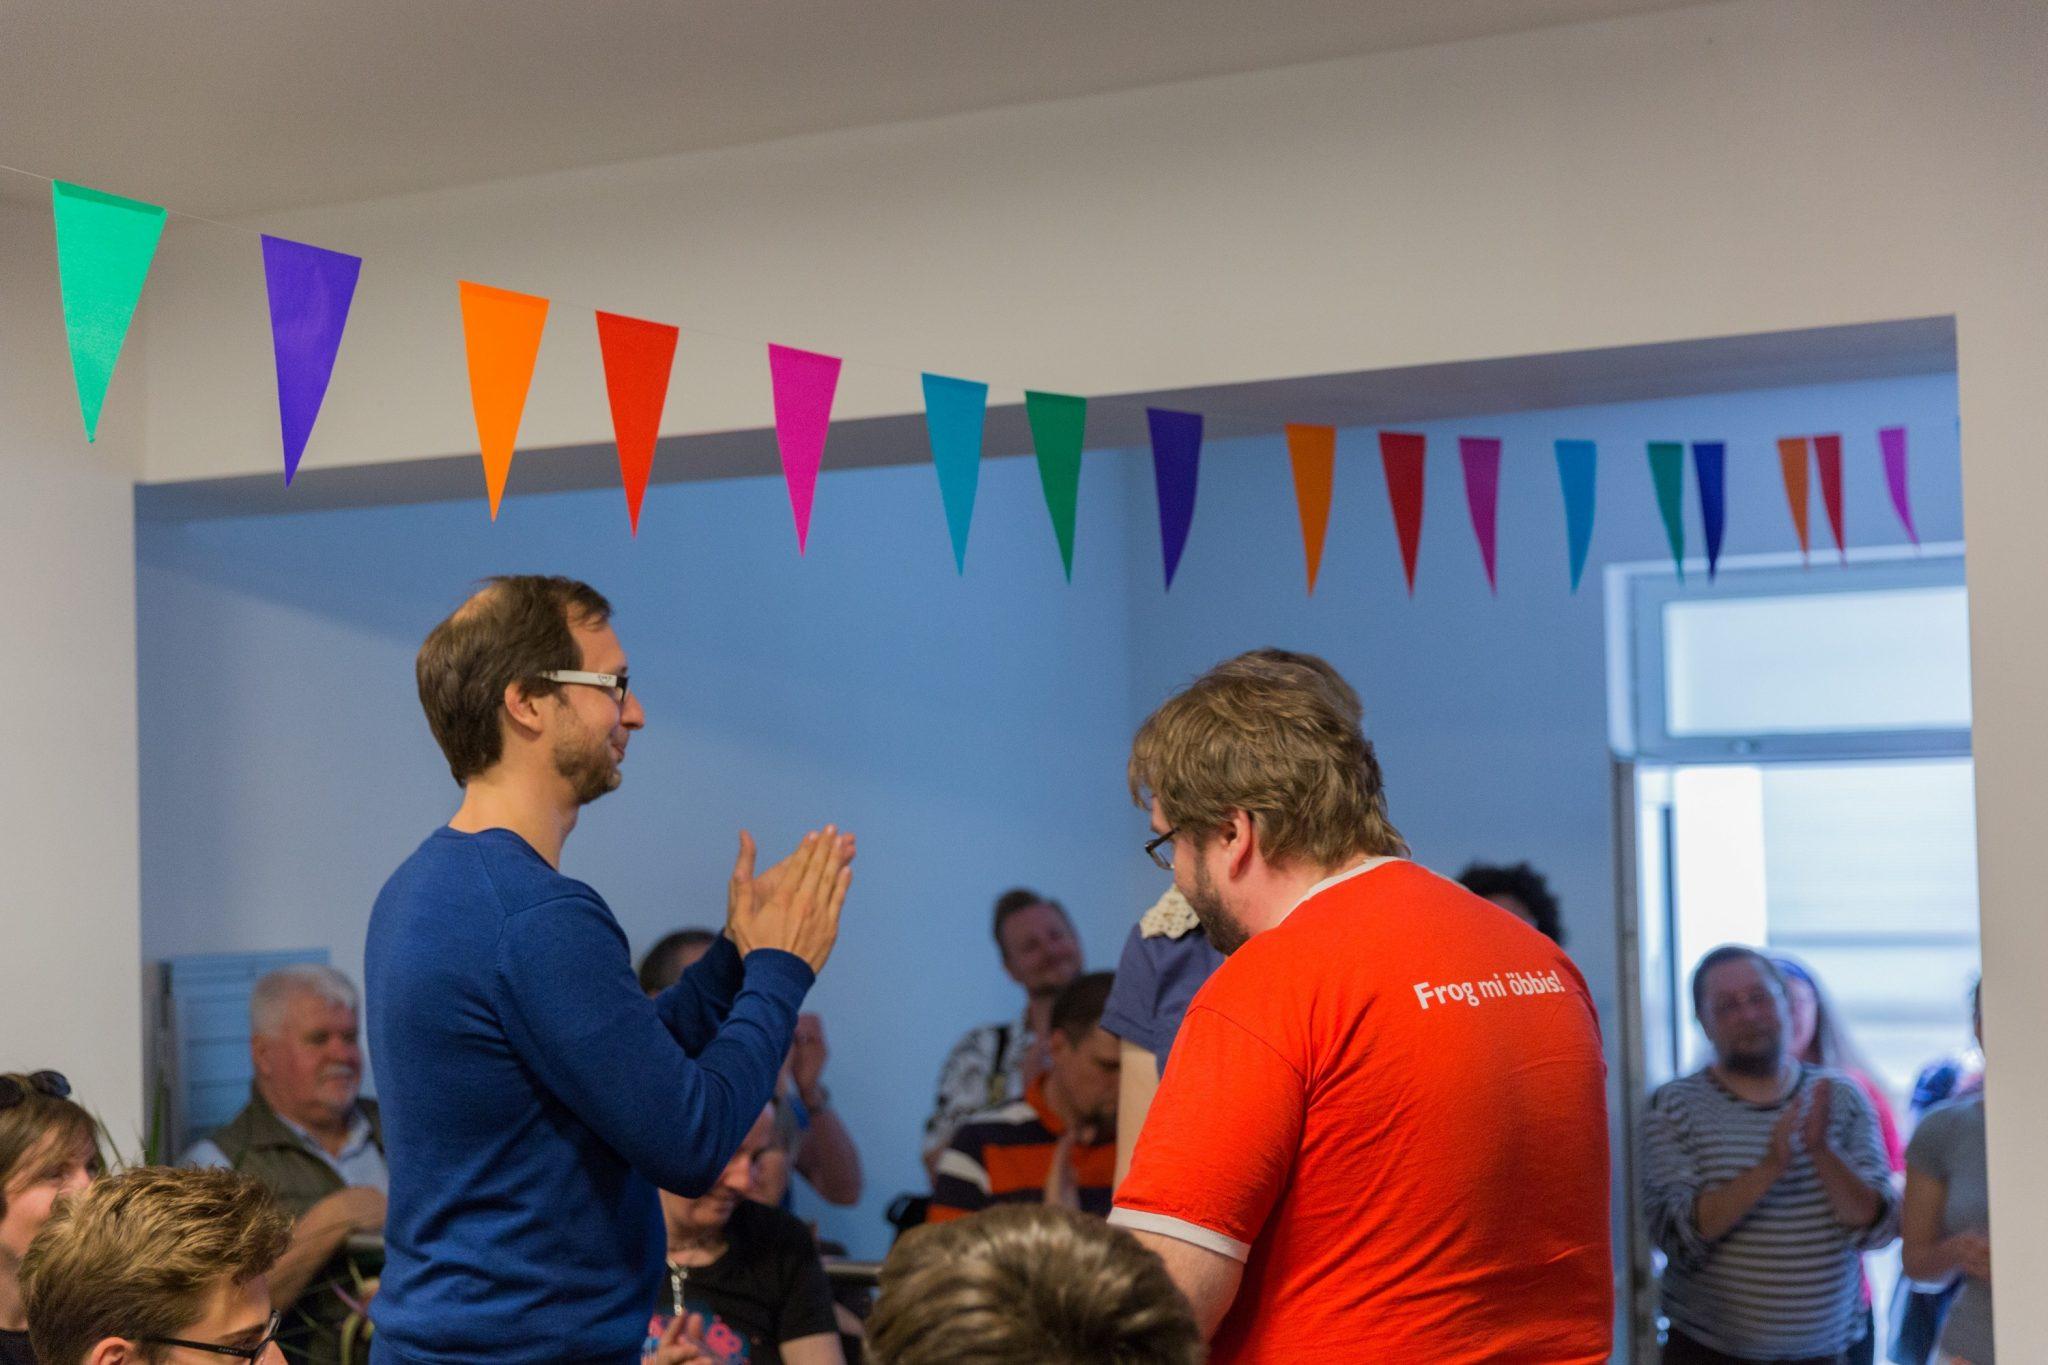 Eröffnungsfeier des WikiBär. Foto: Freddy2001 – Wikimedia Commons. Lizenz: CC-BY-SA-3.0